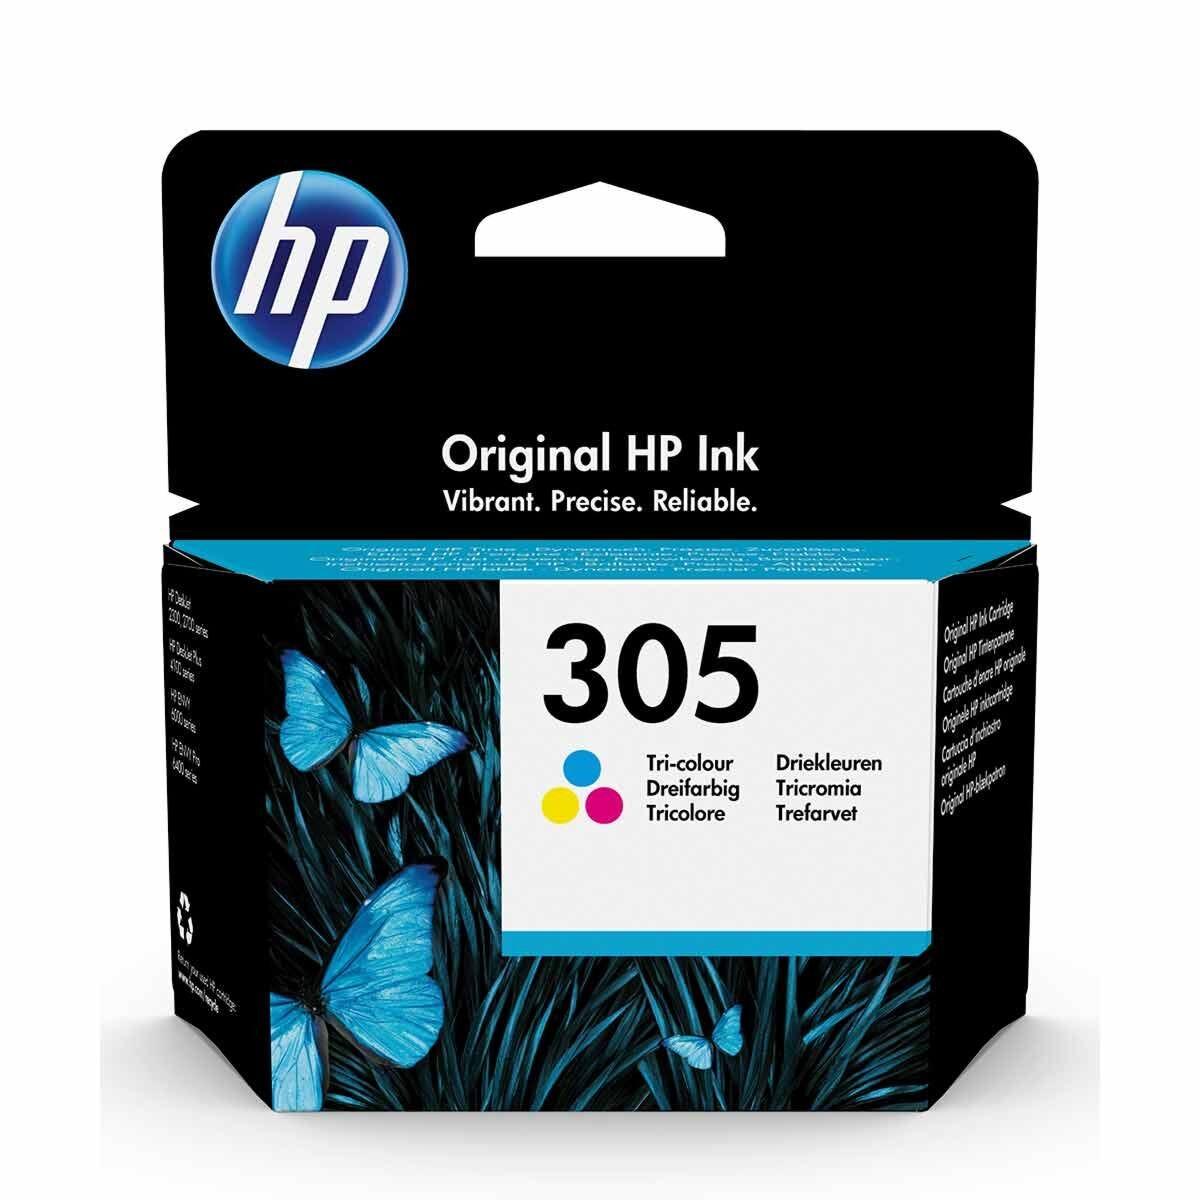 HP 305 Ink Cartridge Tri-colour